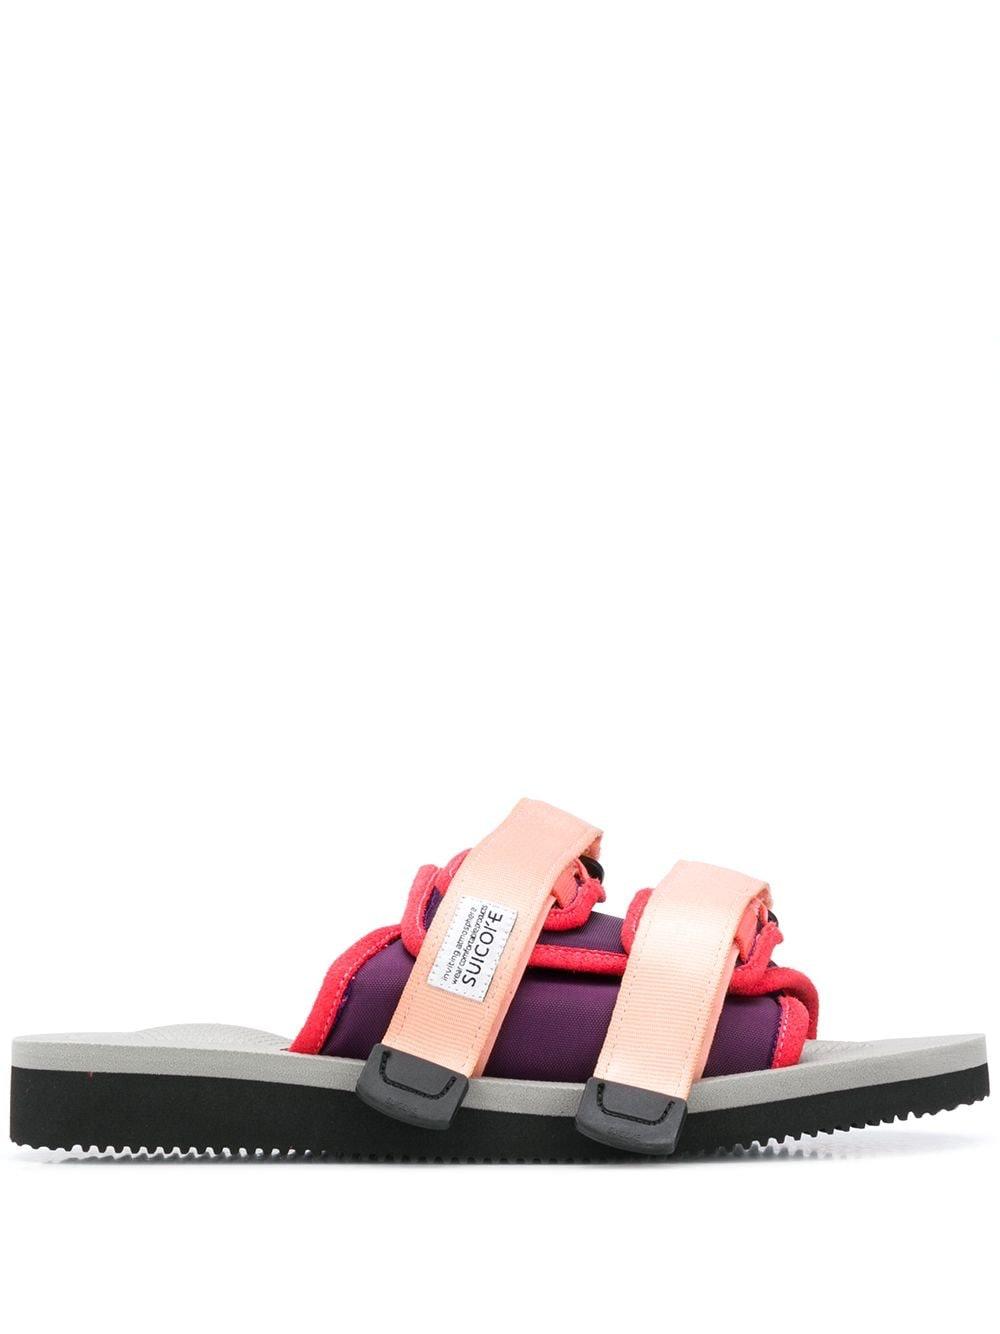 Double Strap Sliders